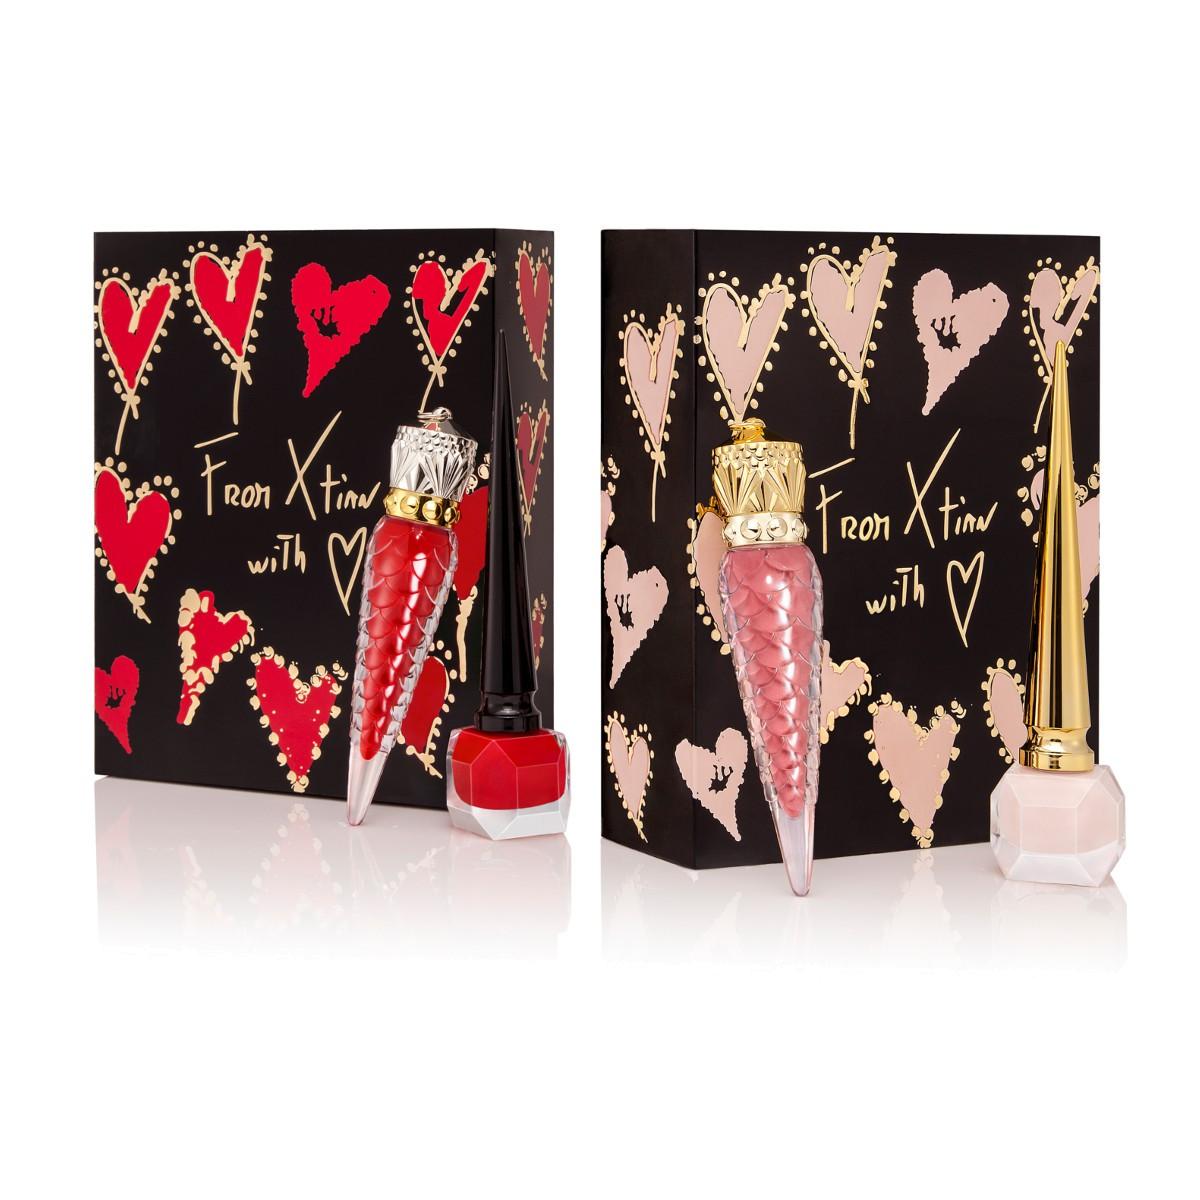 Beauty - Loubivalentine Nude Gift Box - Christian Louboutin